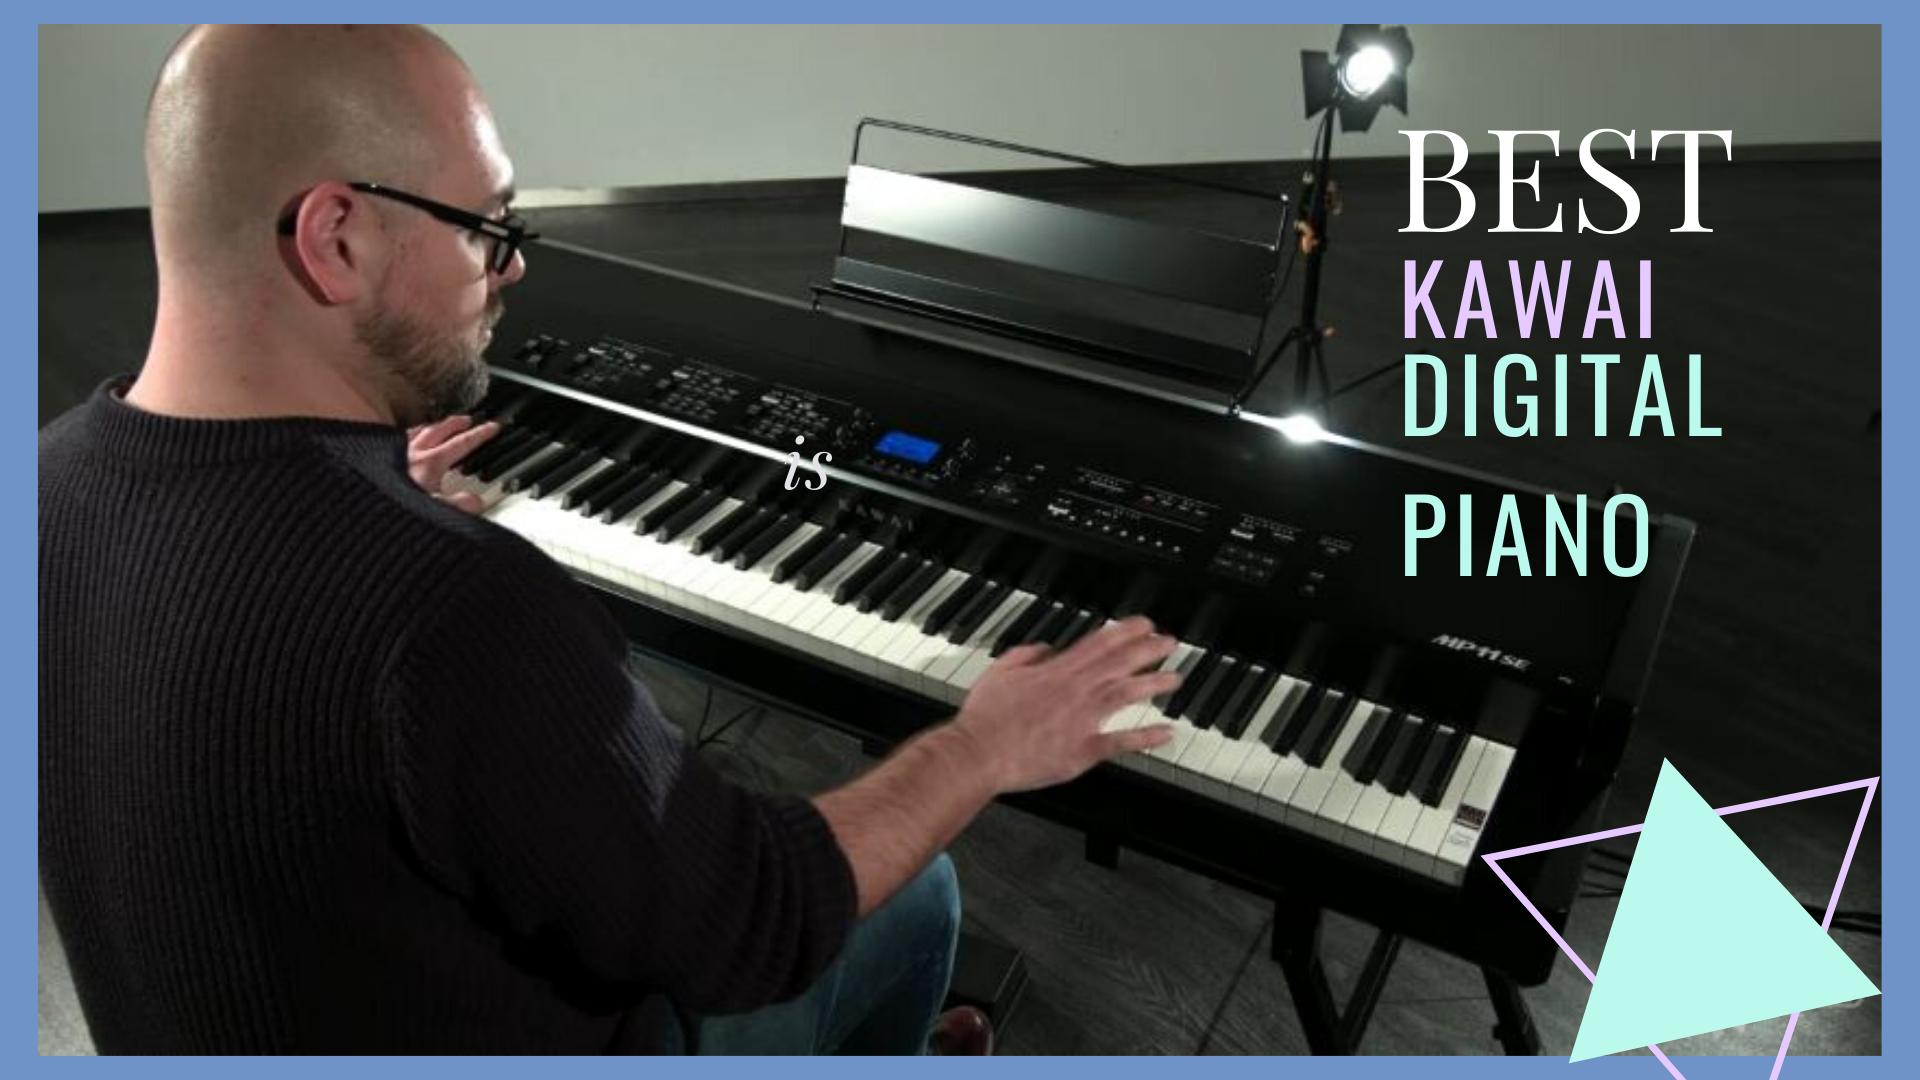 Top 10 Best Kawai Digital Piano On The Market 2021 Reviews